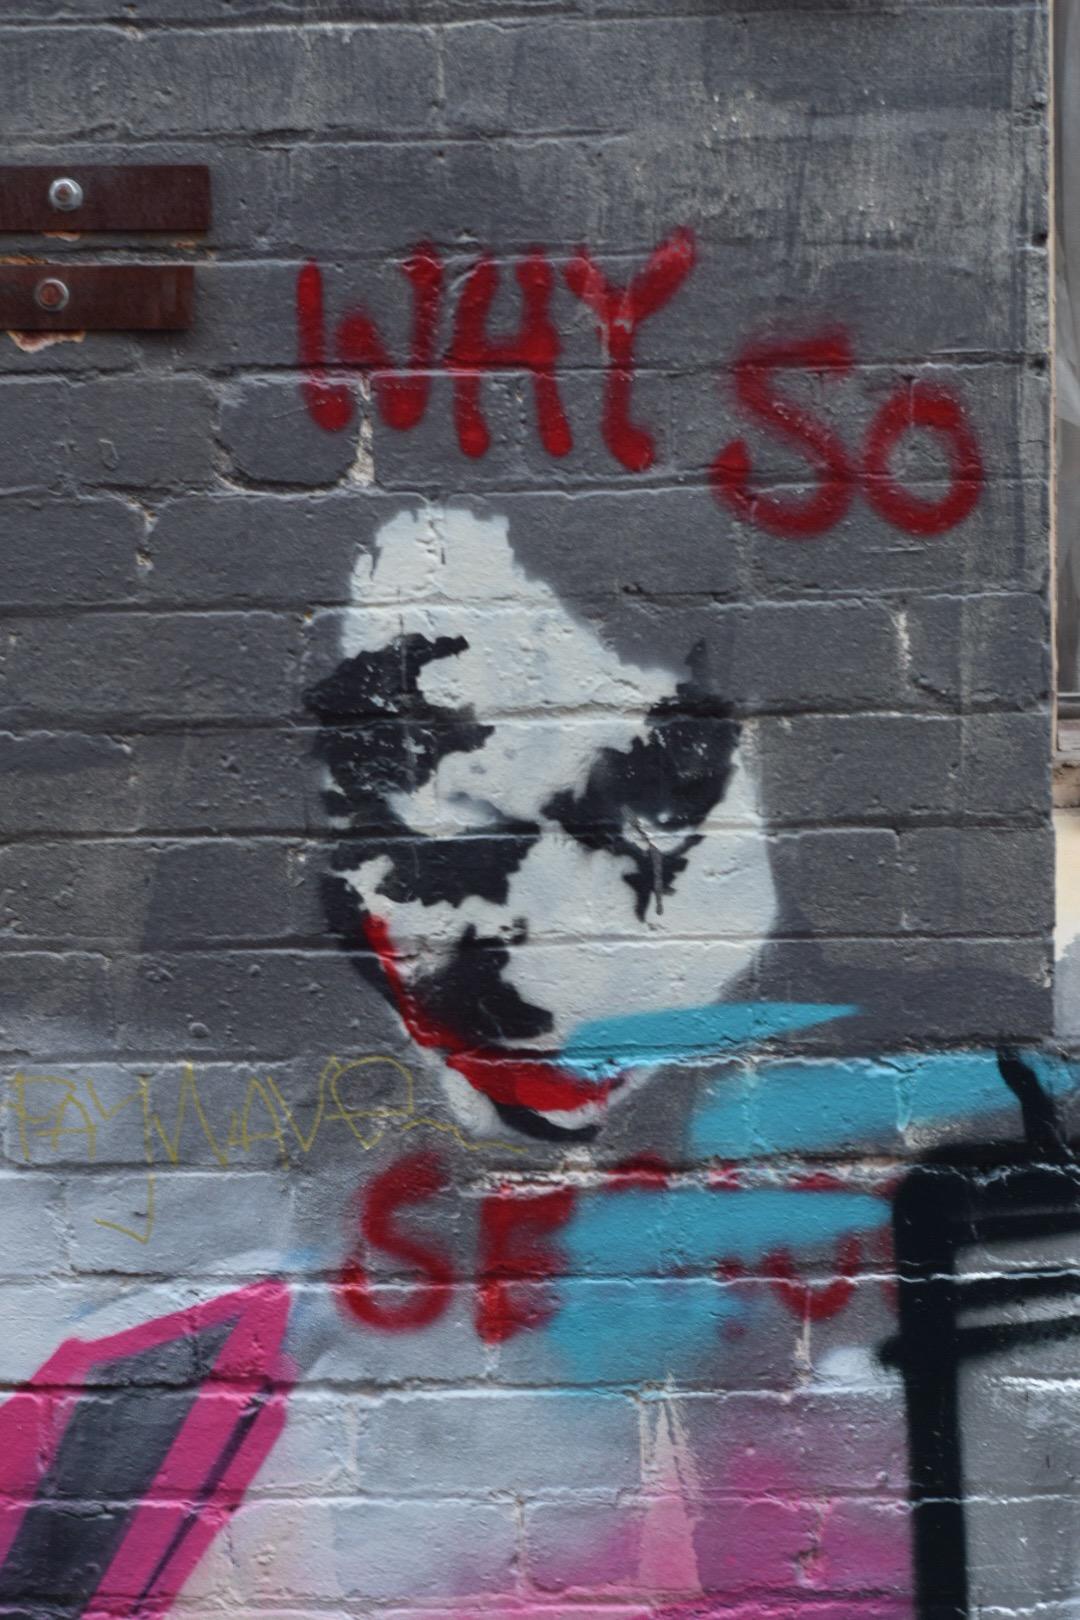 David Cameron, why soserious?